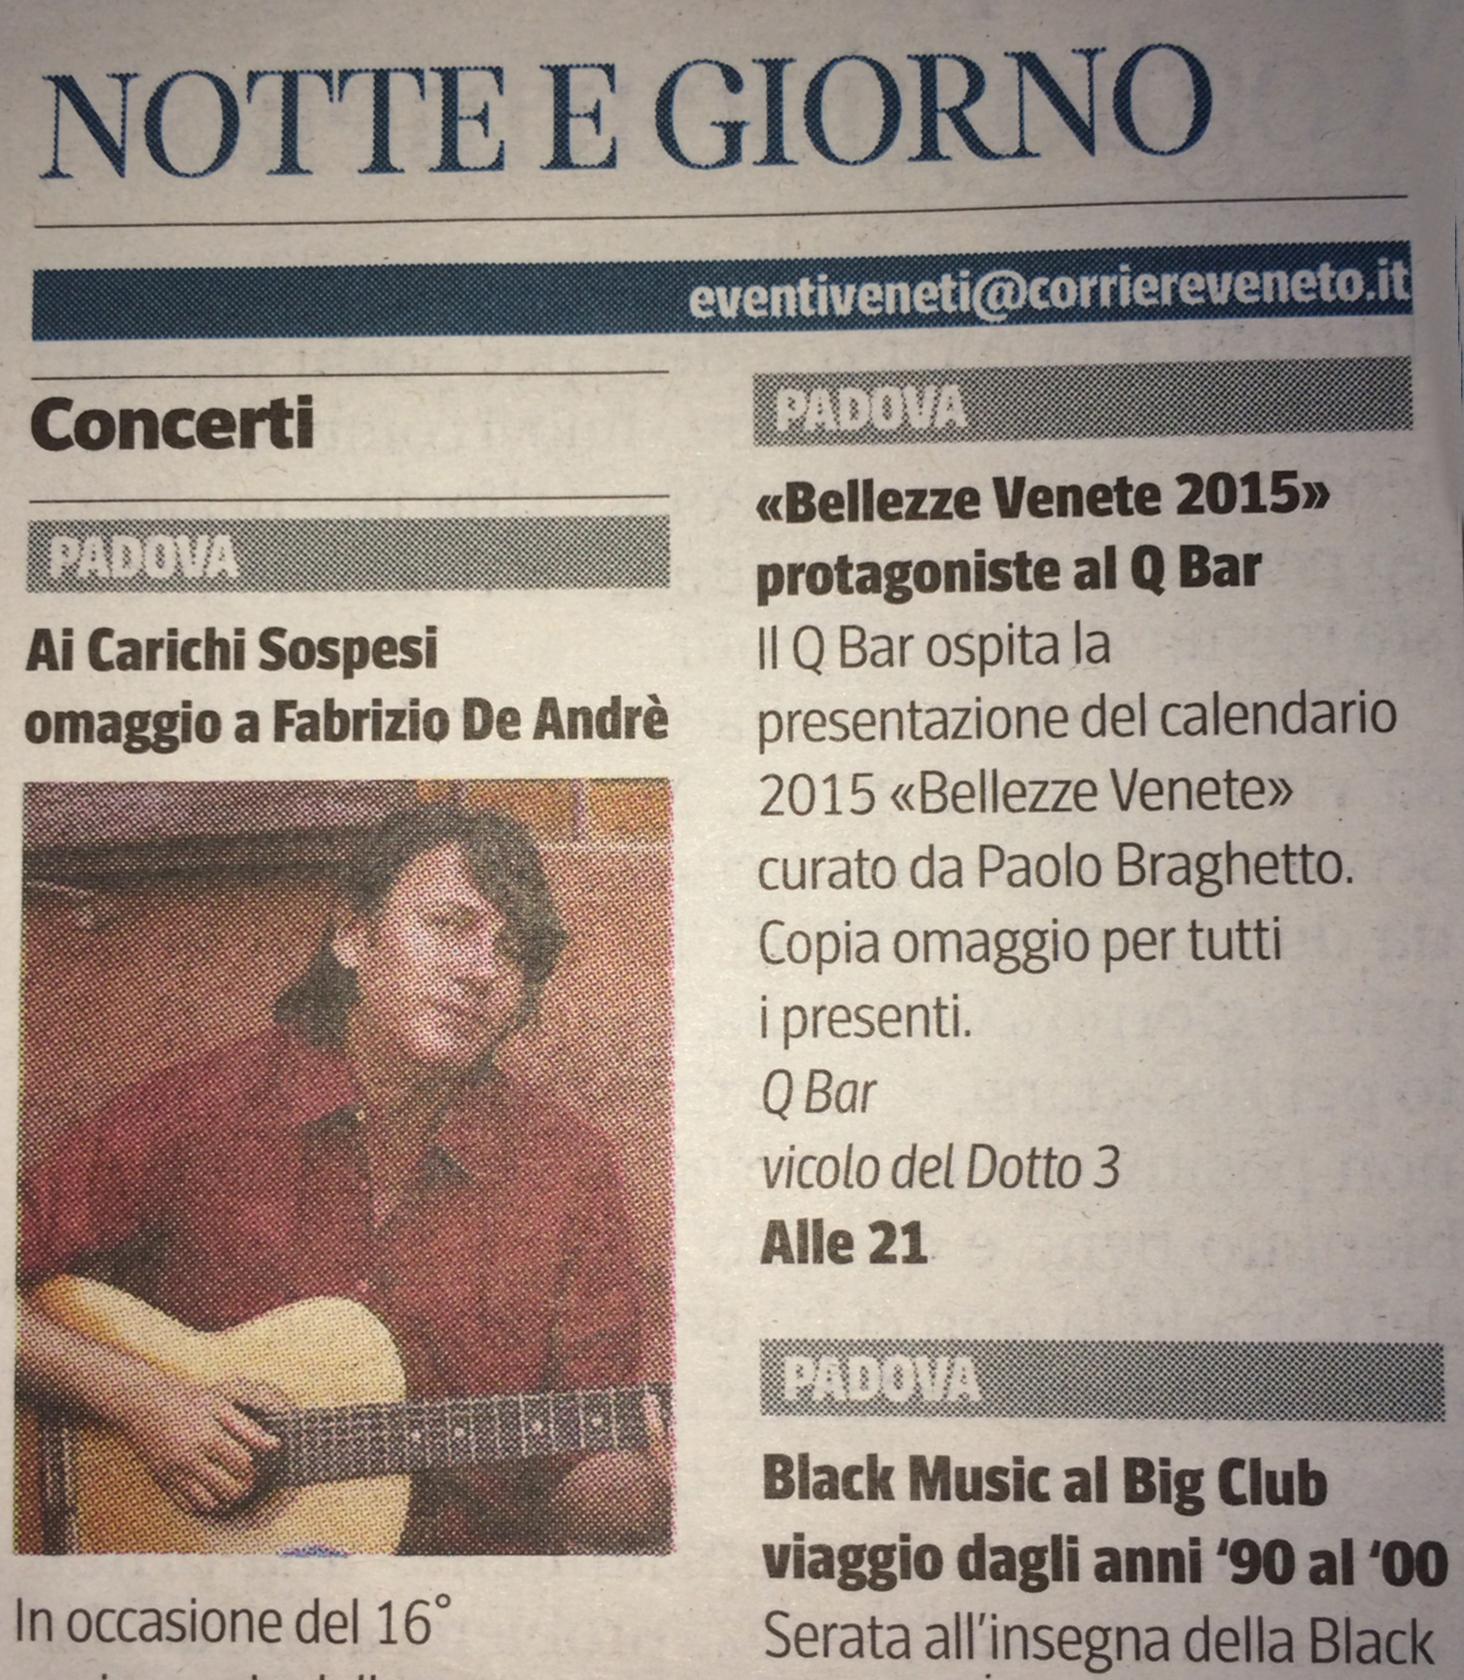 BV15 al Q - Corriere Veneto